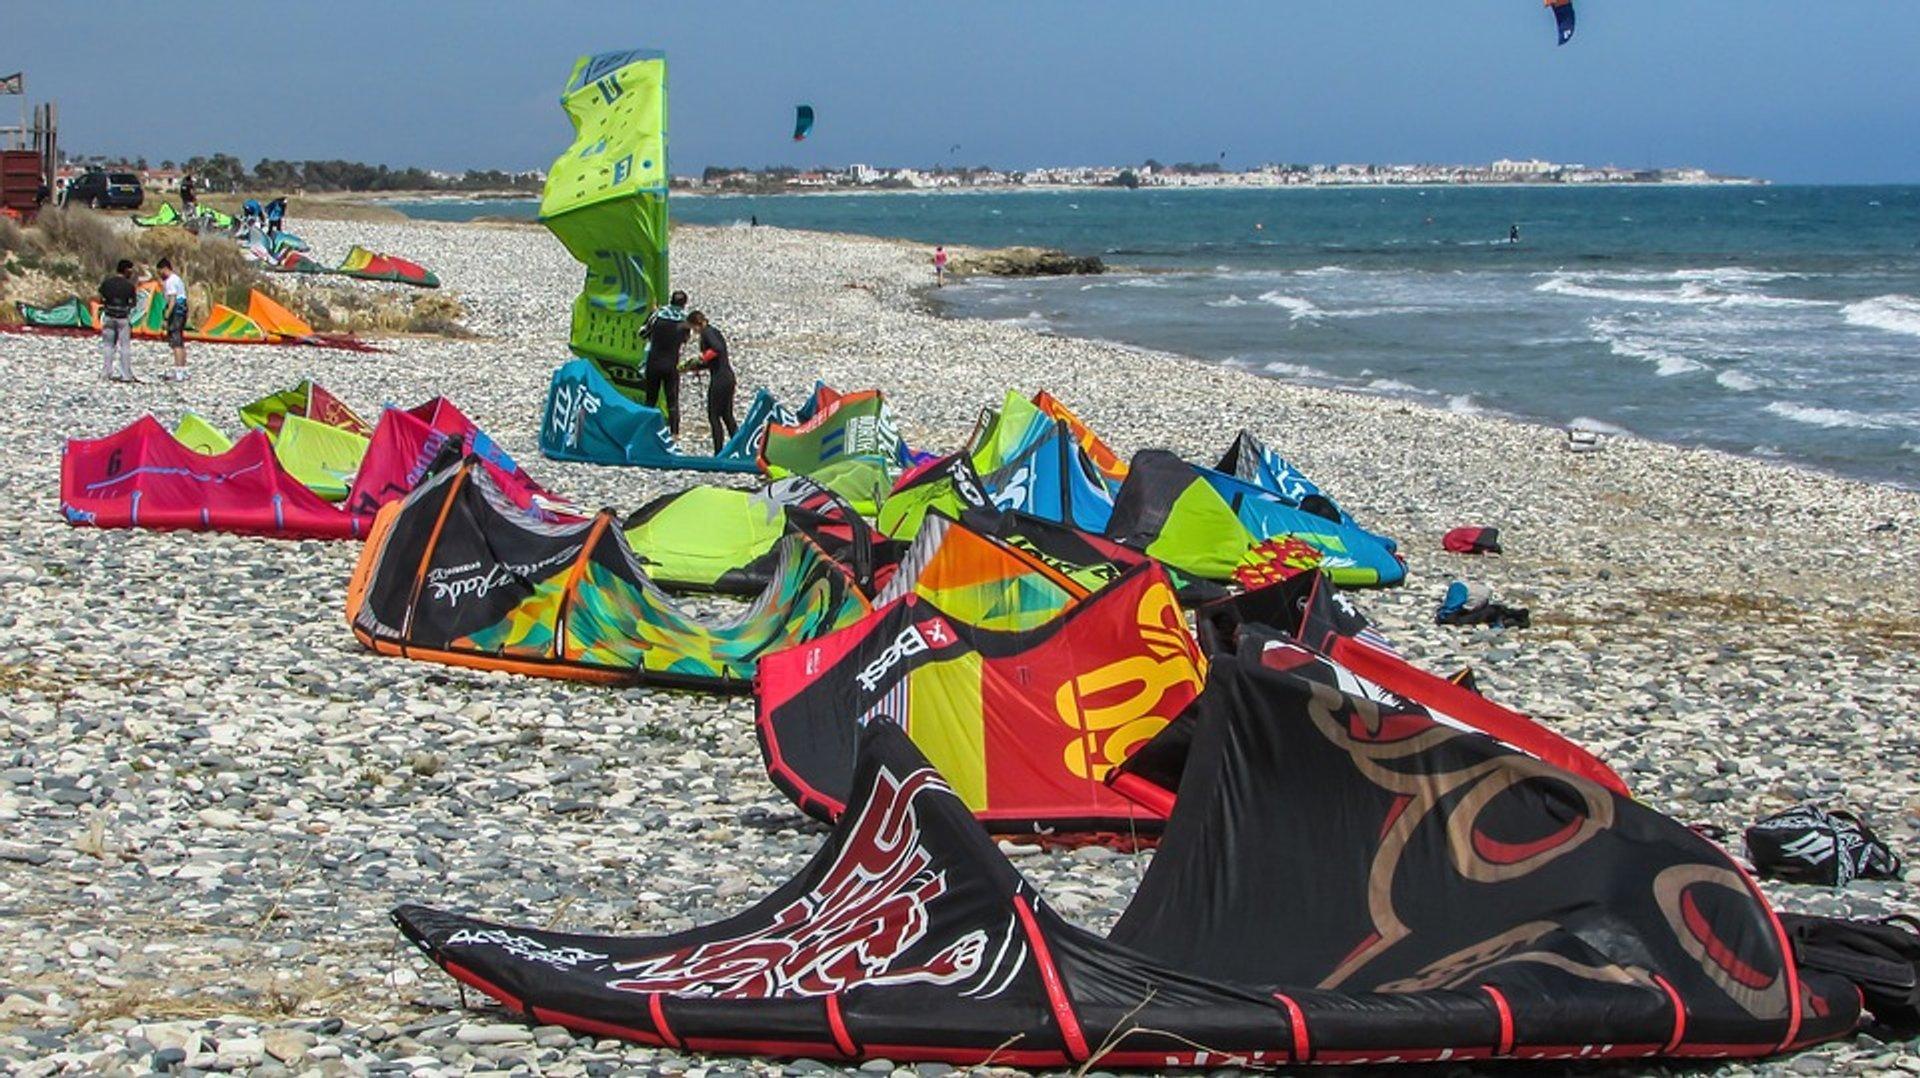 Kitesurfing and Windsurfing  in Cyprus - Best Season 2020